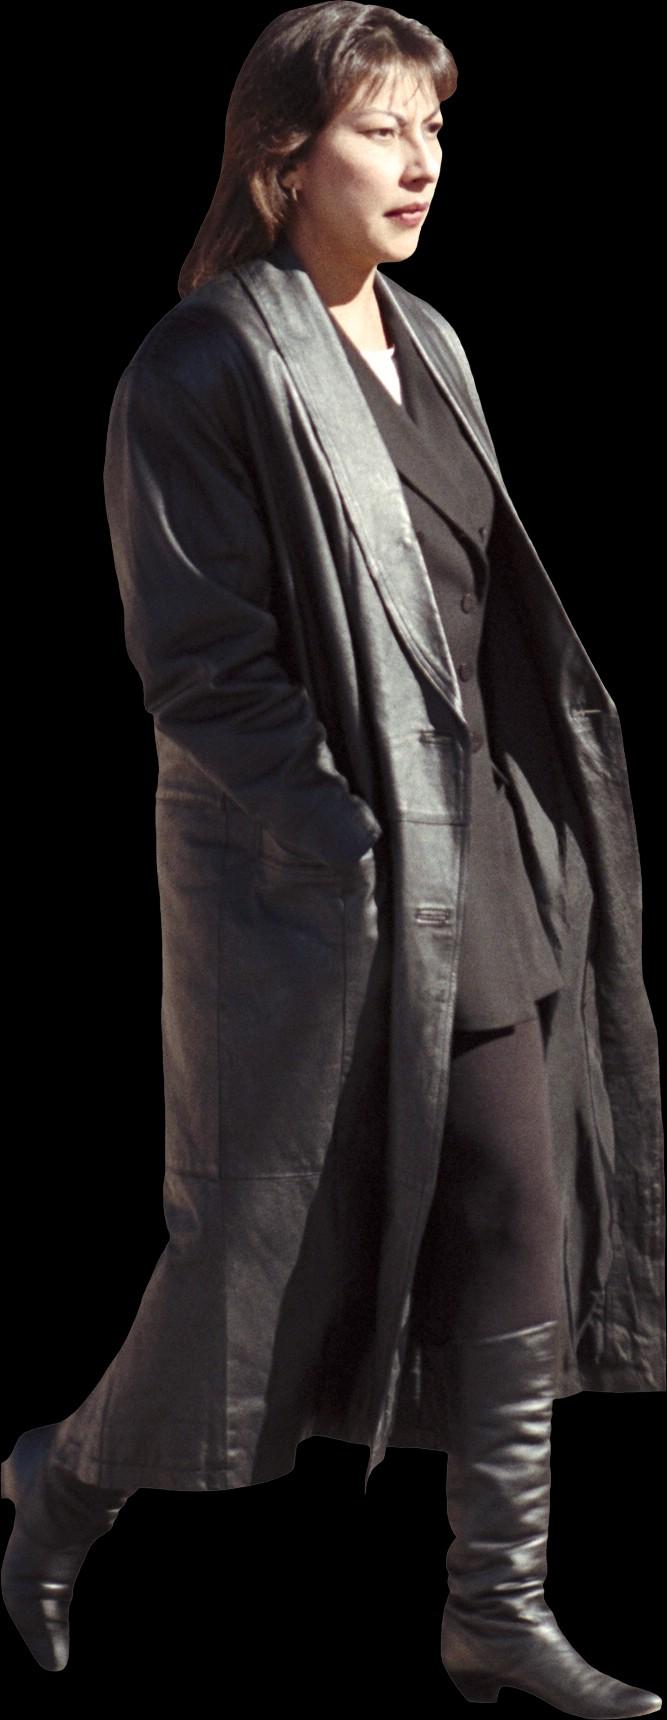 Текстура людей | Текстура людей на ...: junior3d.ru/texture/lyudi-na-otdykhe.html